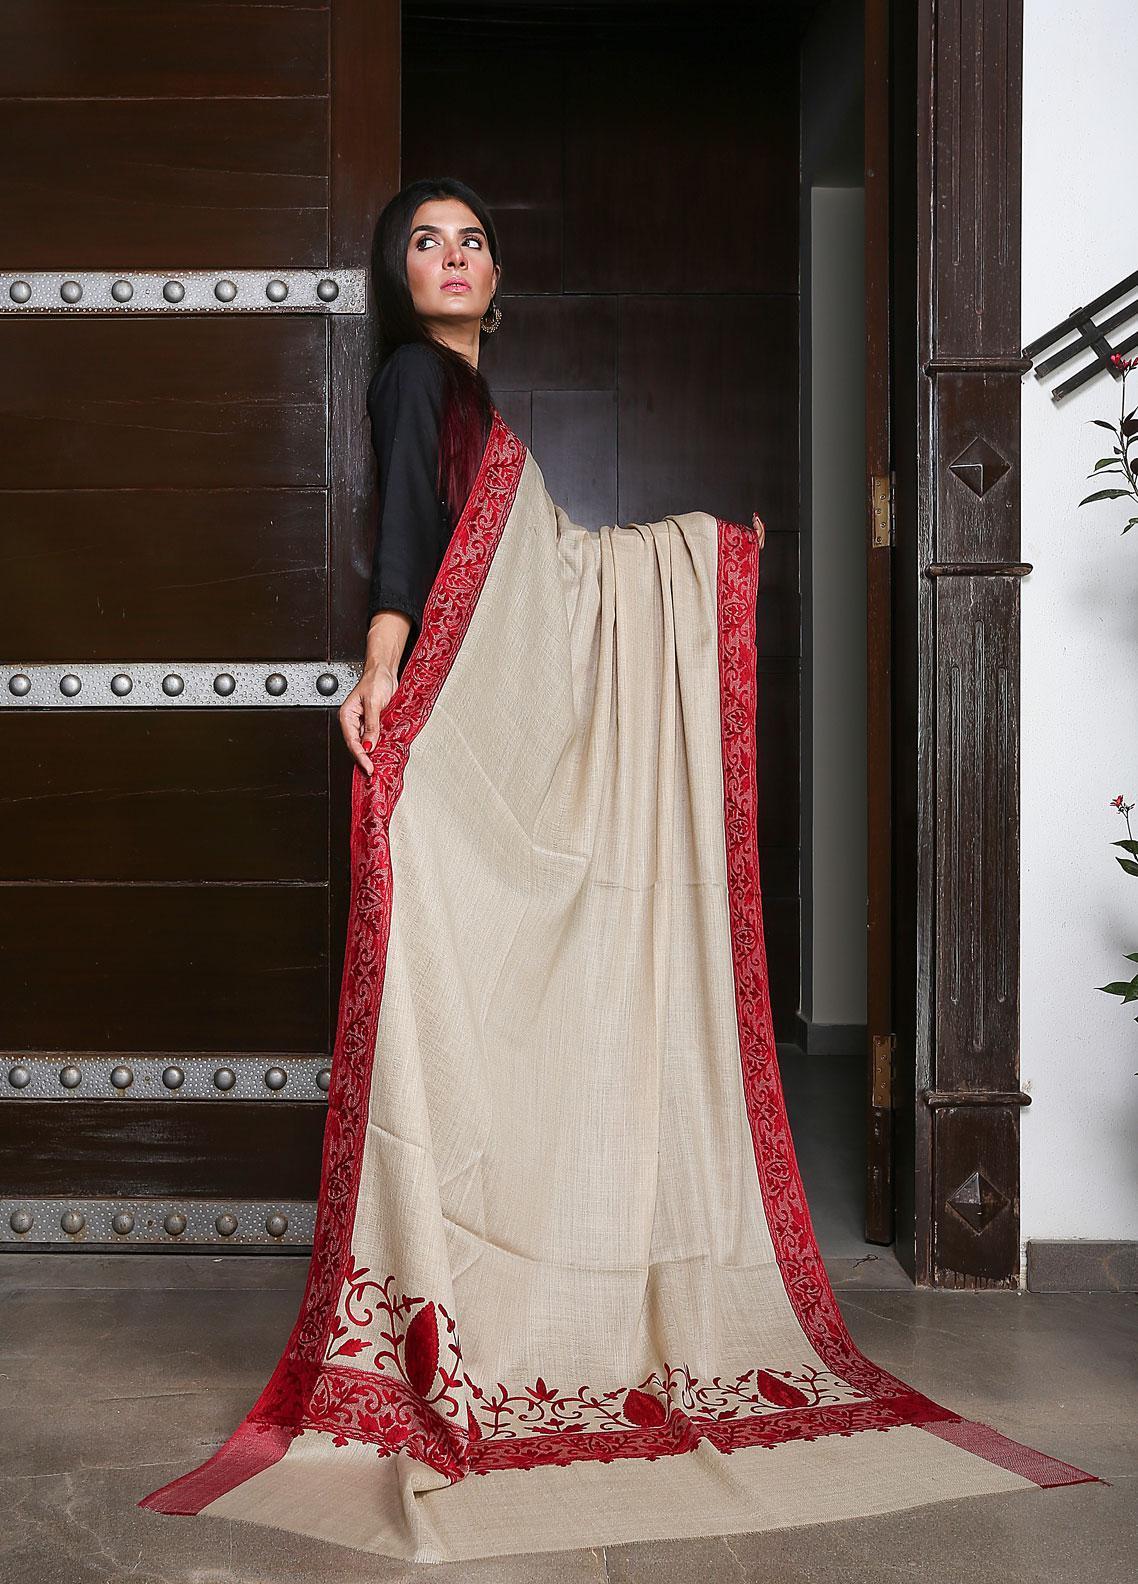 Sanaulla Exclusive Range Embroidered Pashmina  Shawl 19-MIR-196 Fawn - Kashmiri Shawls